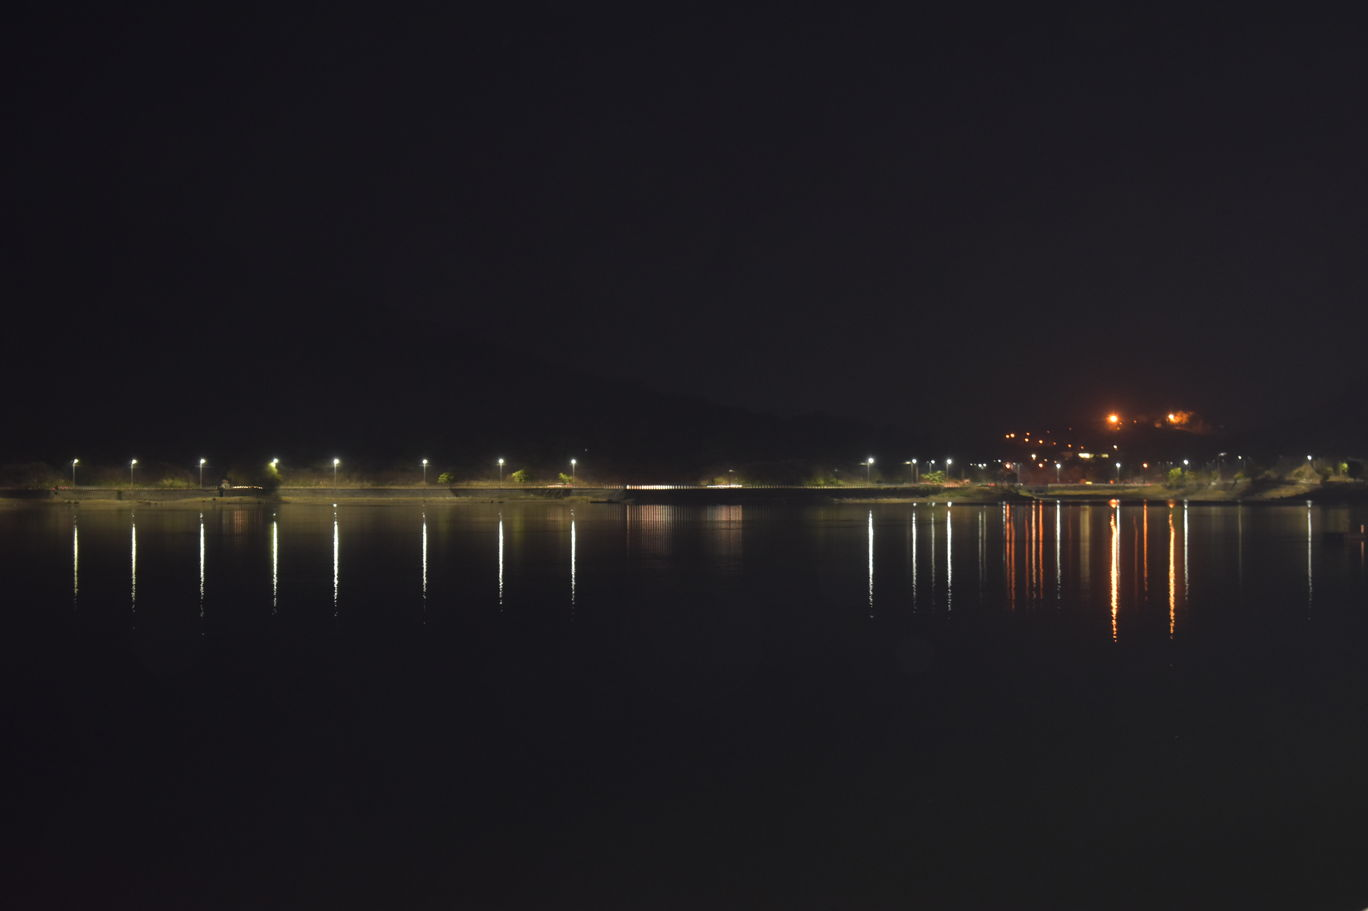 Photo of Udaipur By Shubham Shrivastava